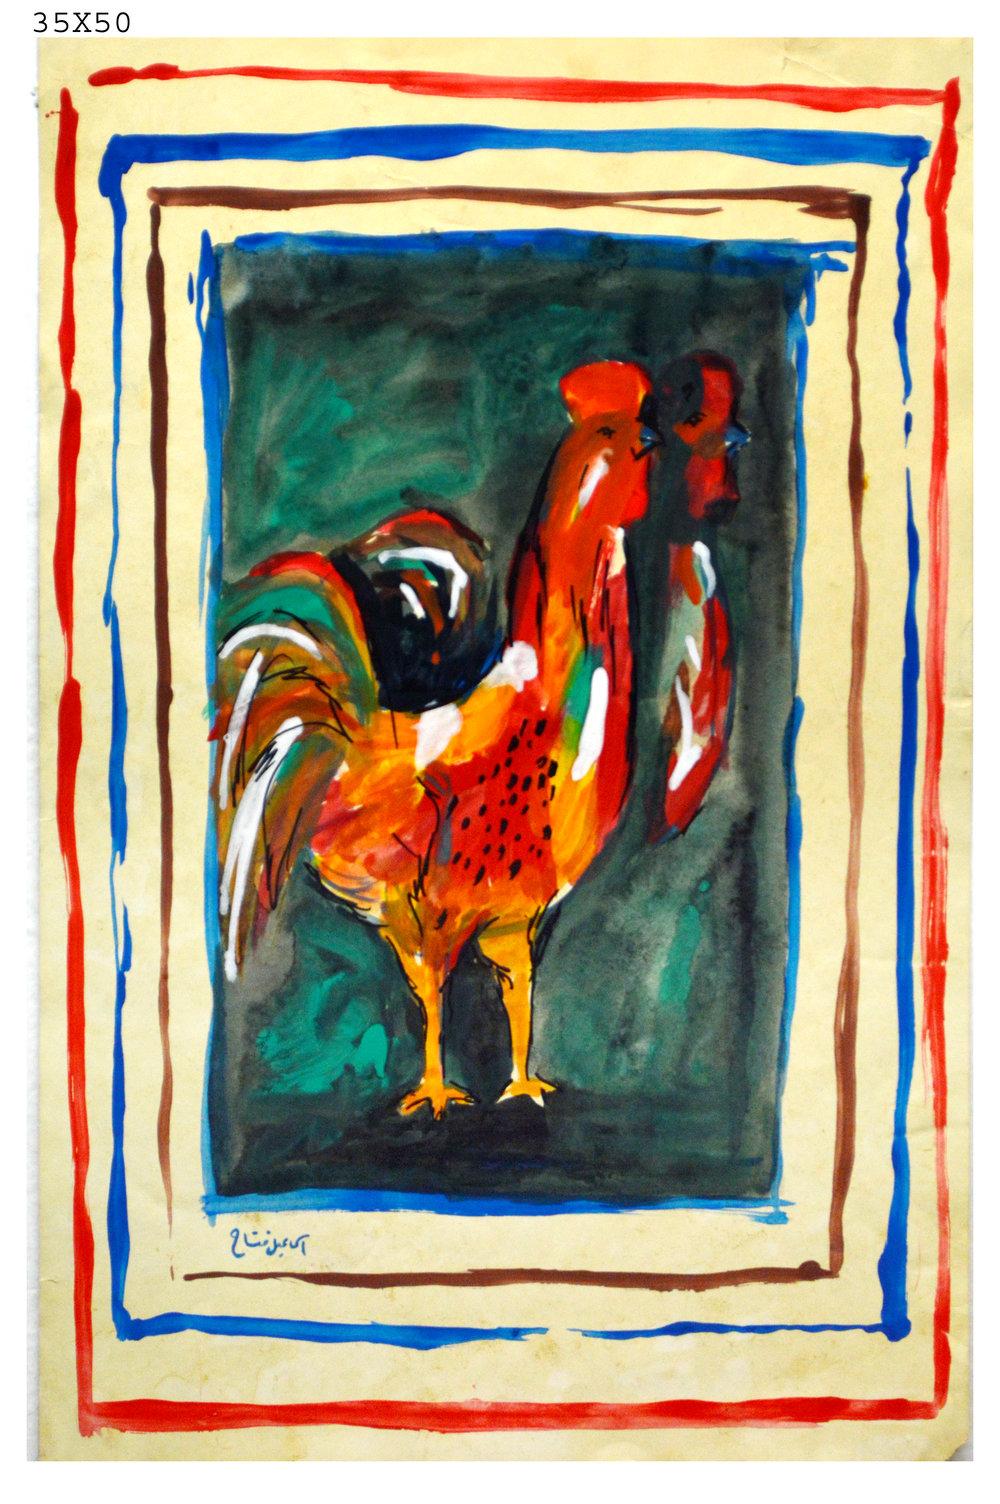 Lot 28: Ismail Fattah - الفنان اسماعيل فتاح (Iraq) 1934 - 2004, 1970s, Gouache on paper, Est: $4,500 - $6,500